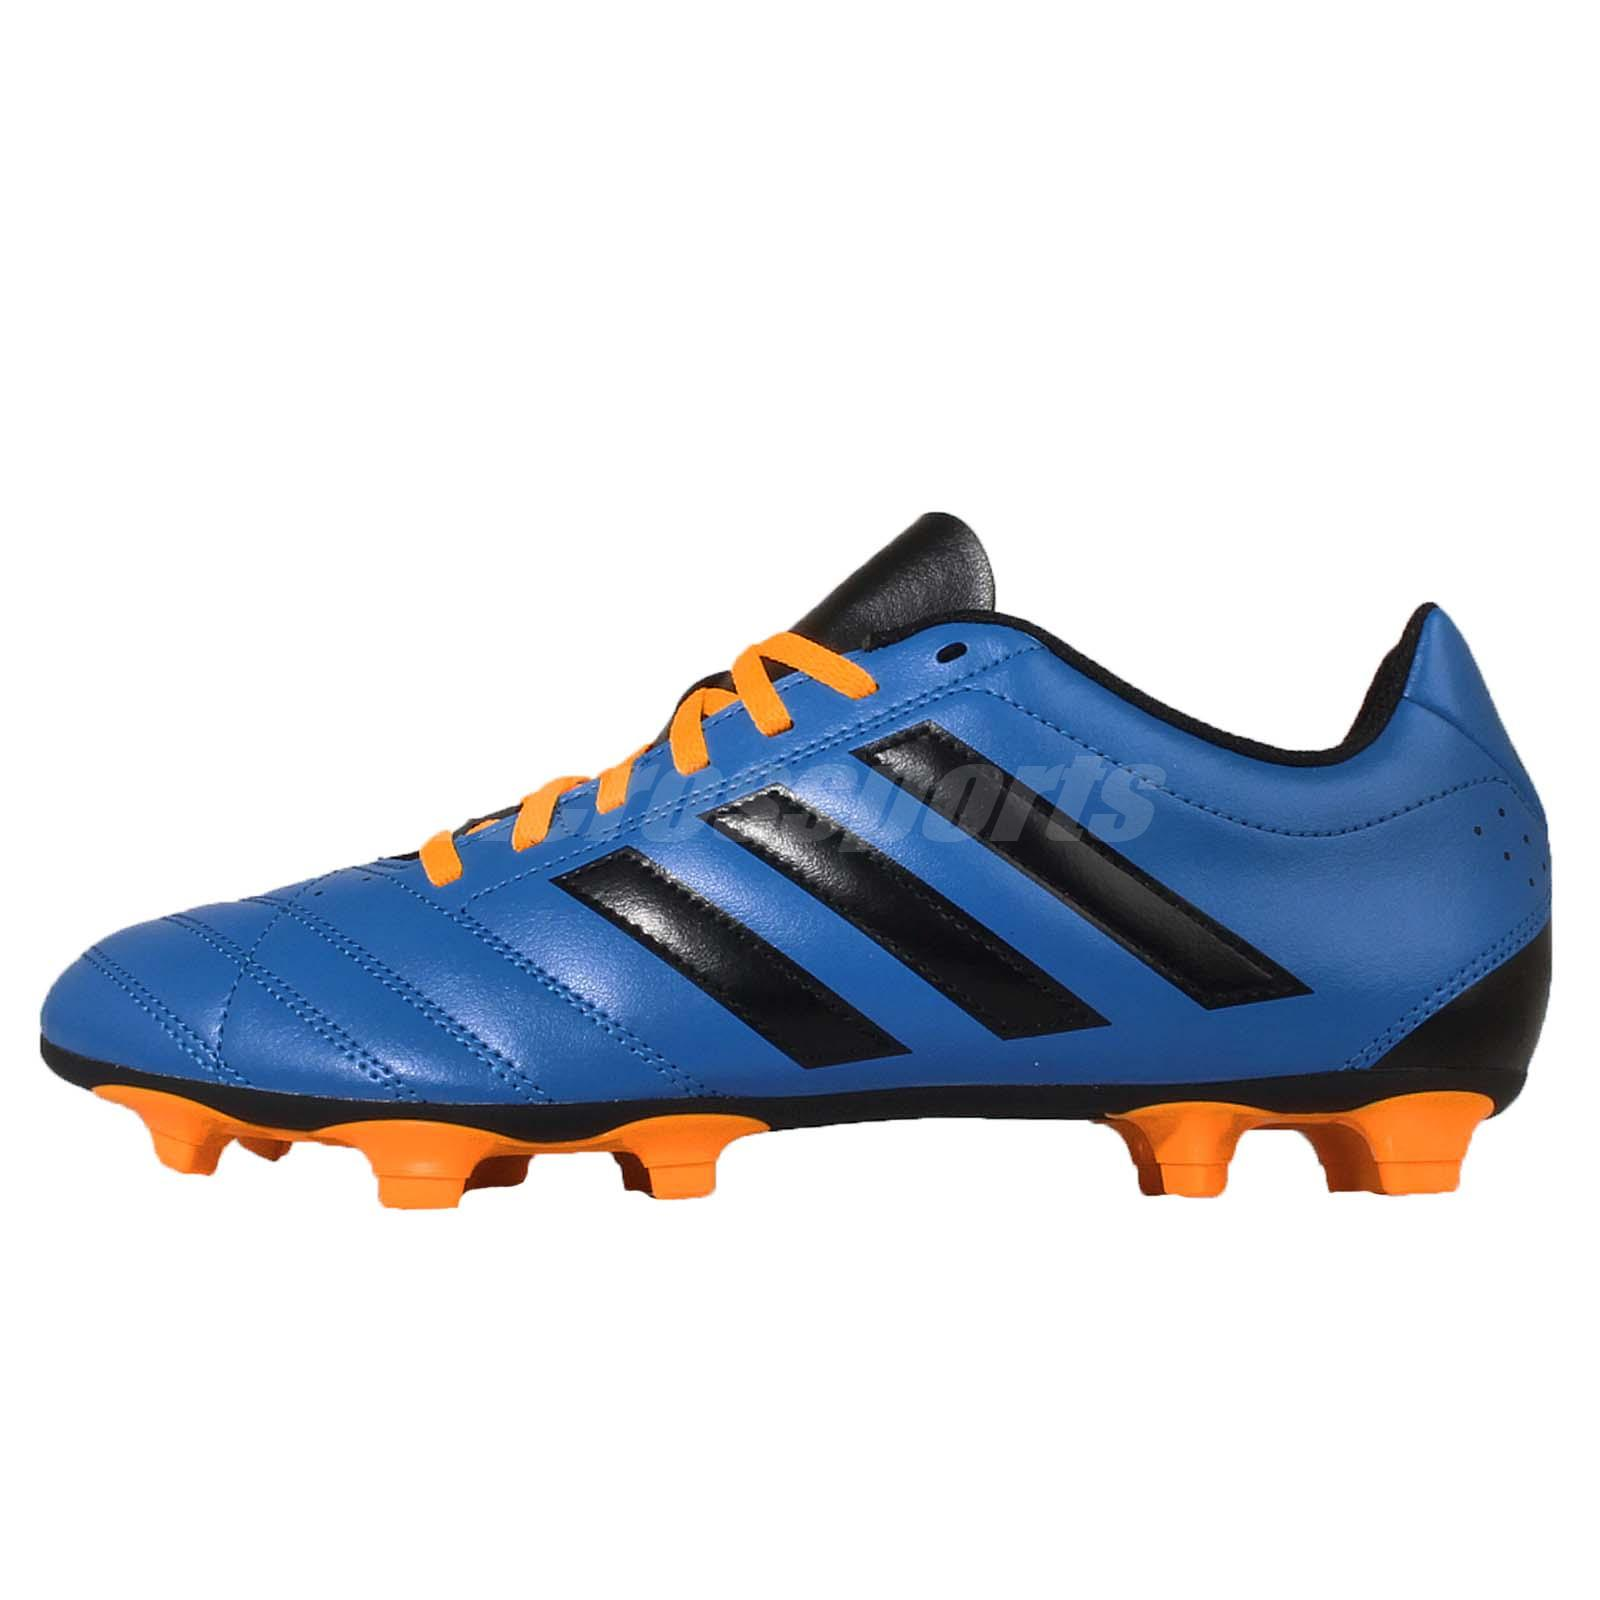 adidas goletto v fg blue black yellow mens soccer shoes. Black Bedroom Furniture Sets. Home Design Ideas